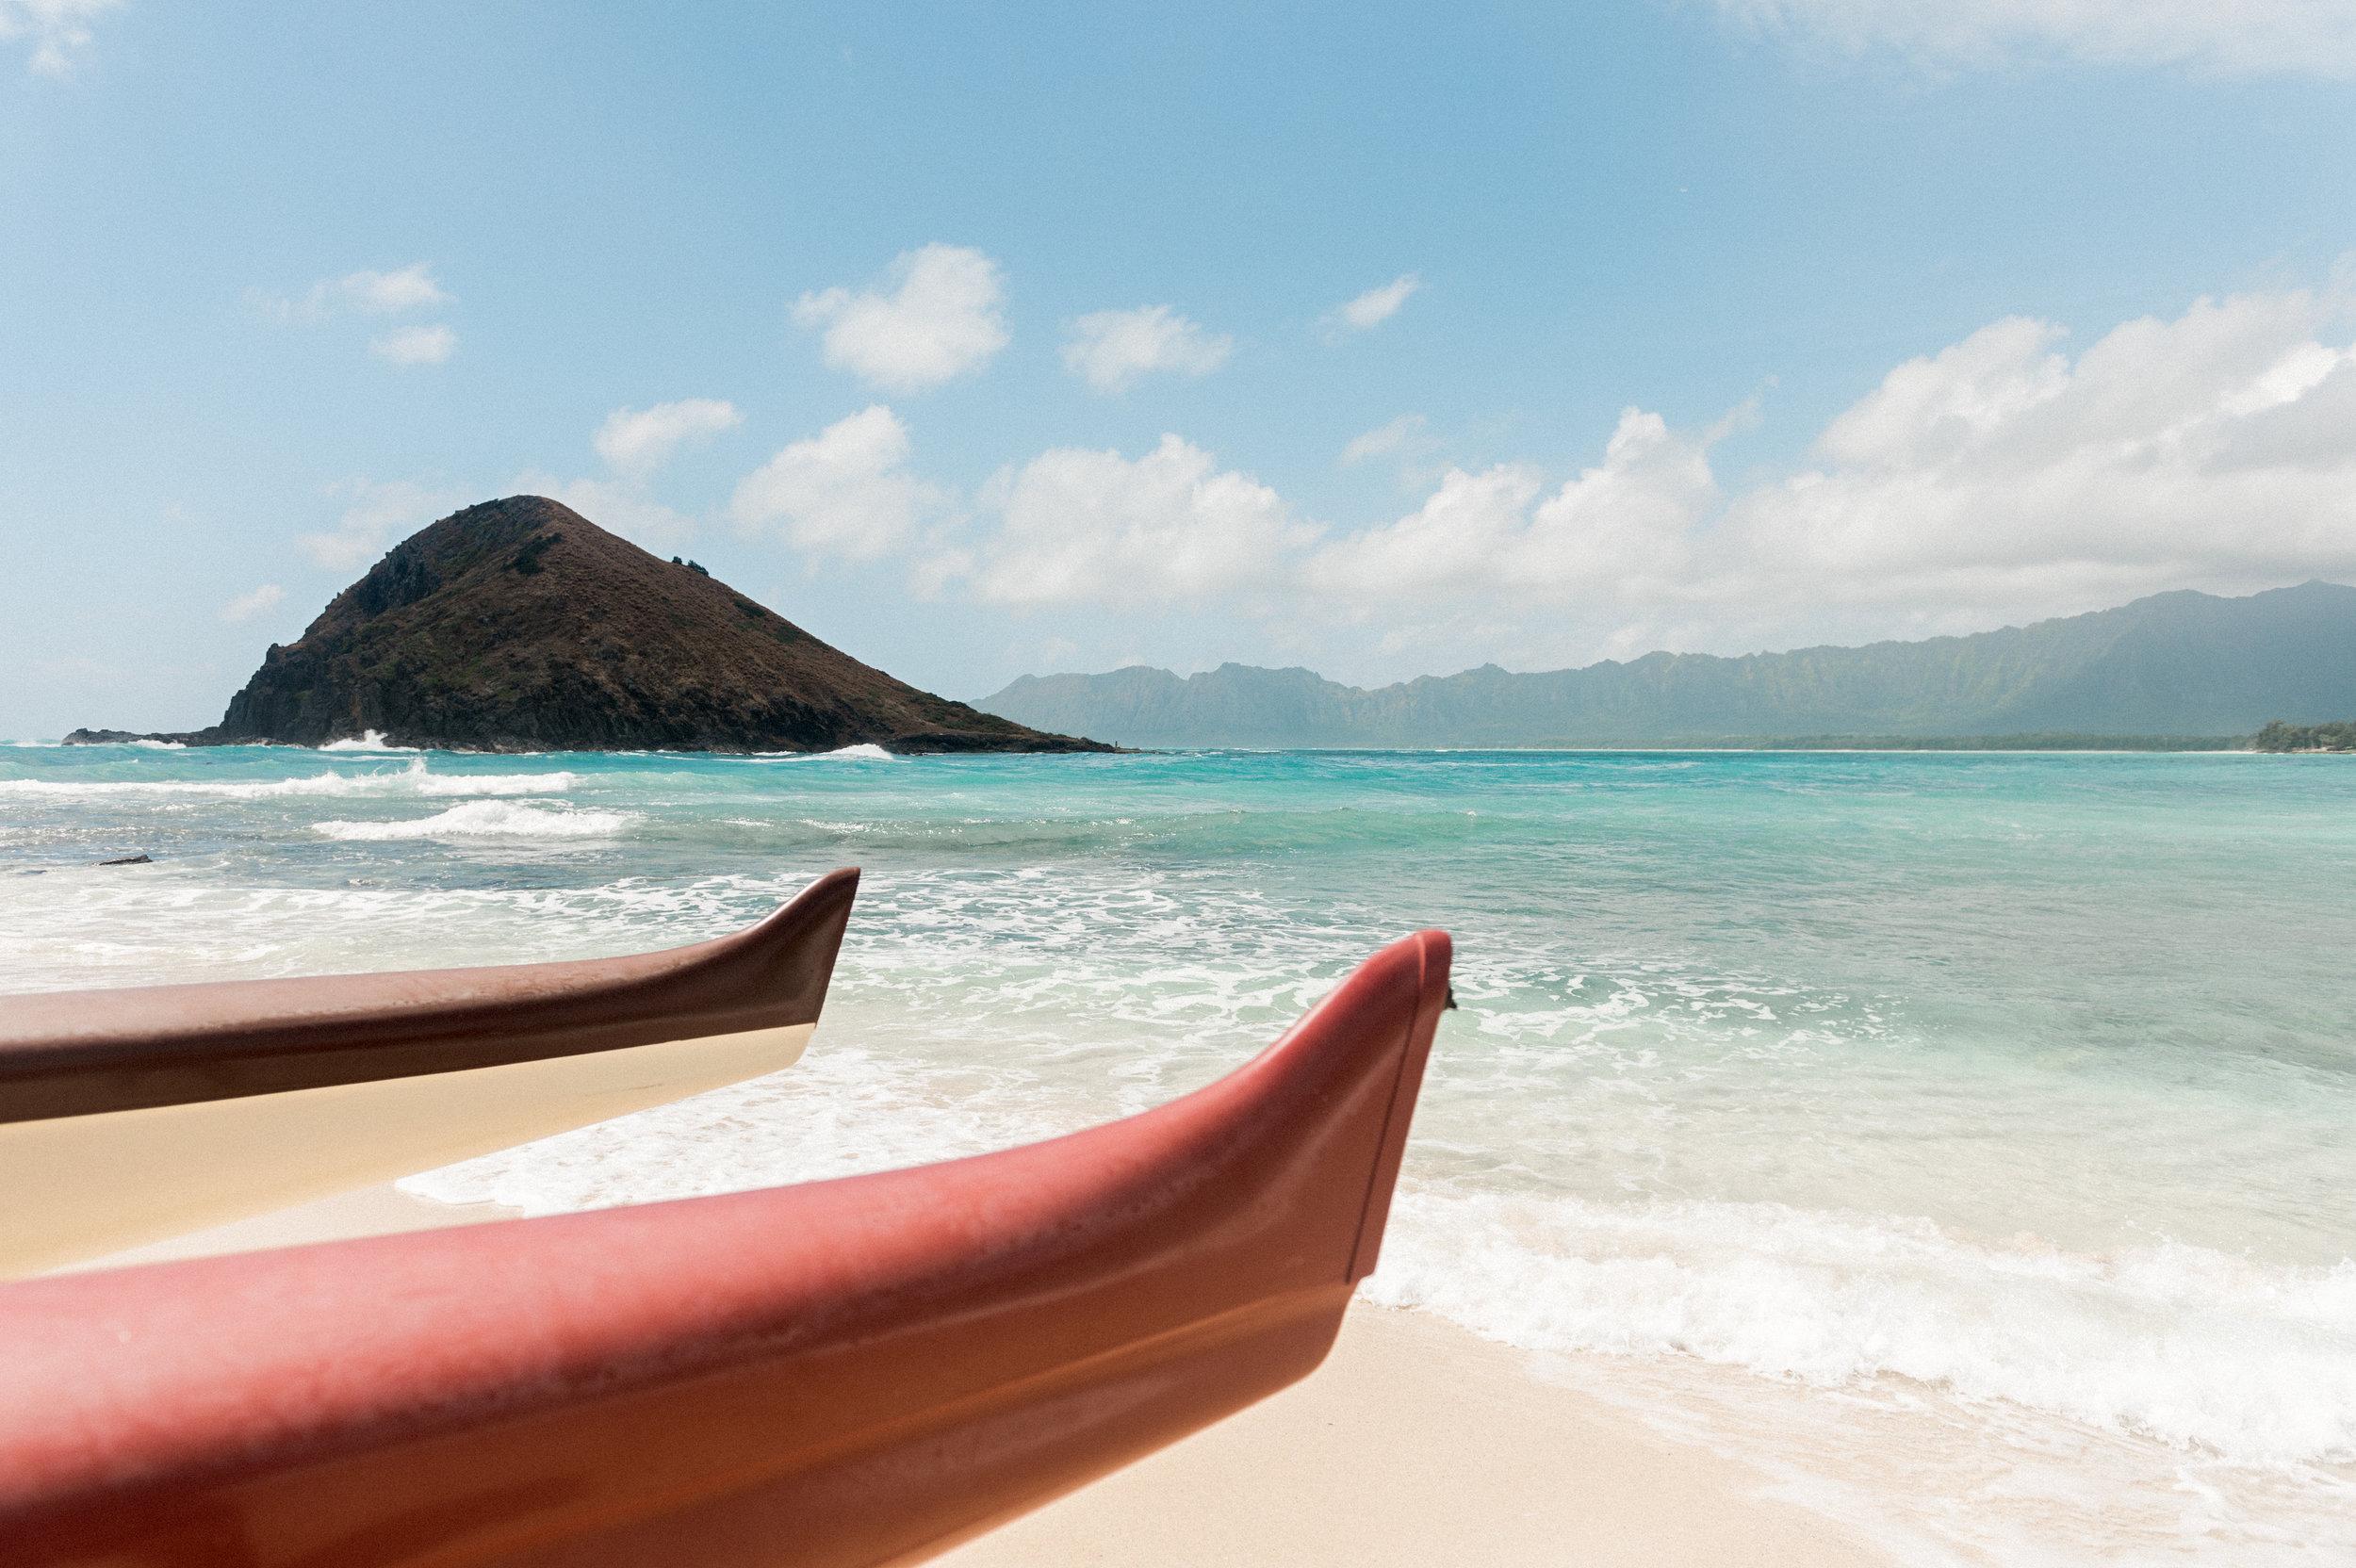 koa_canoes0019.jpg